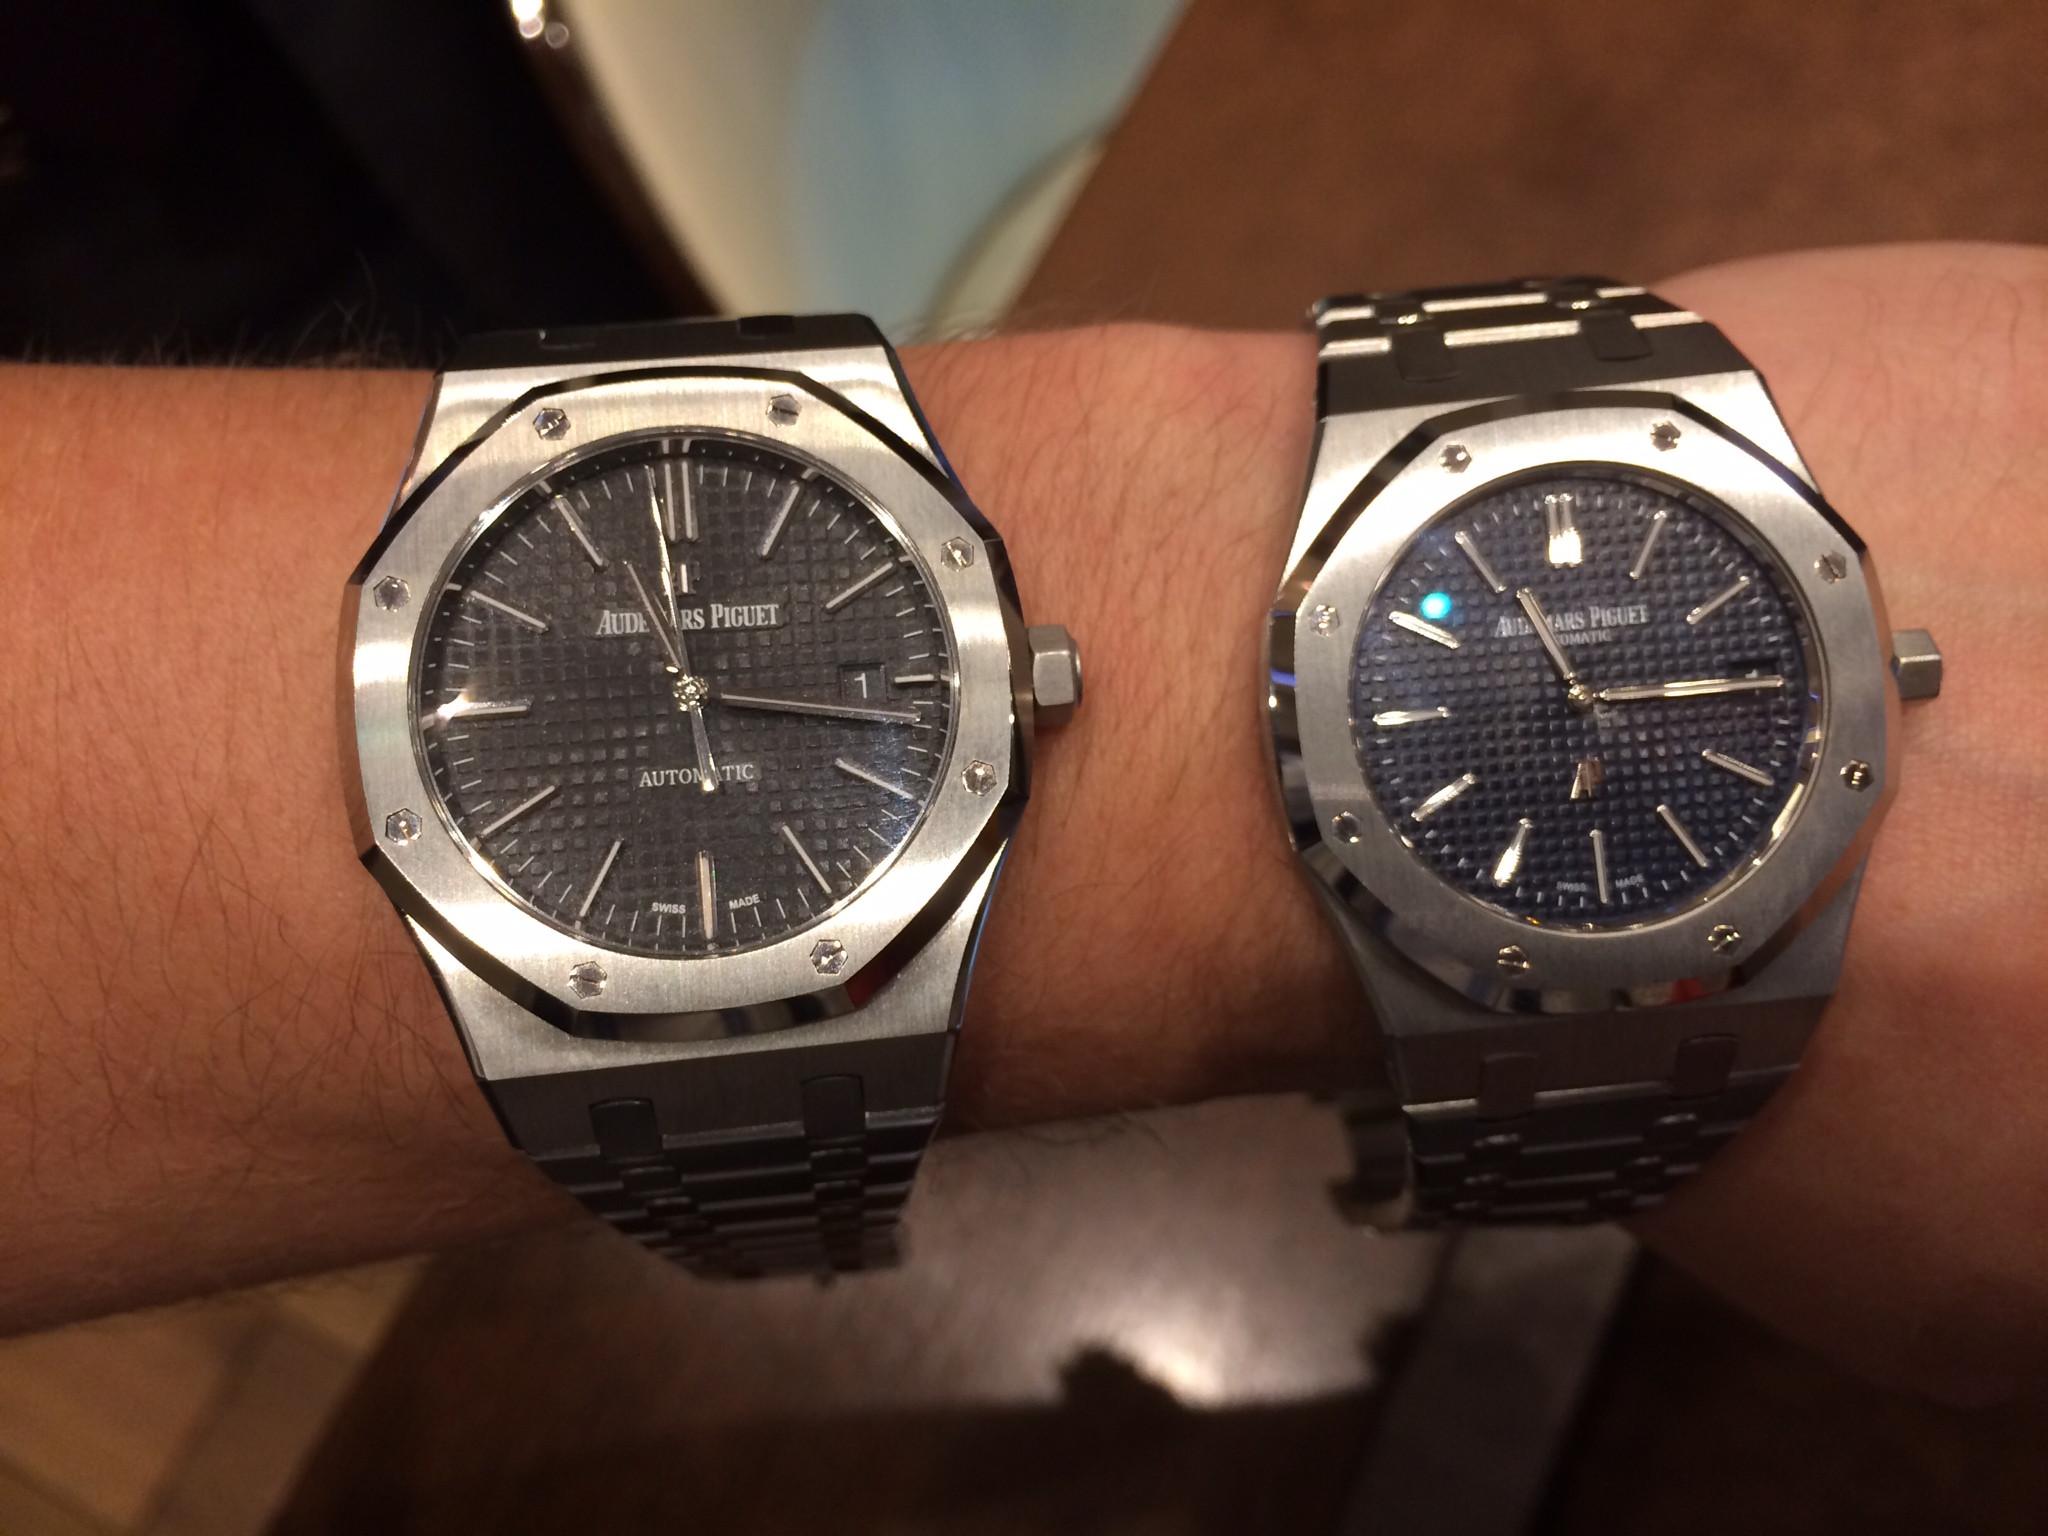 Audemars Piguet Royal Oak 15400 Two-Tone Replica Watches